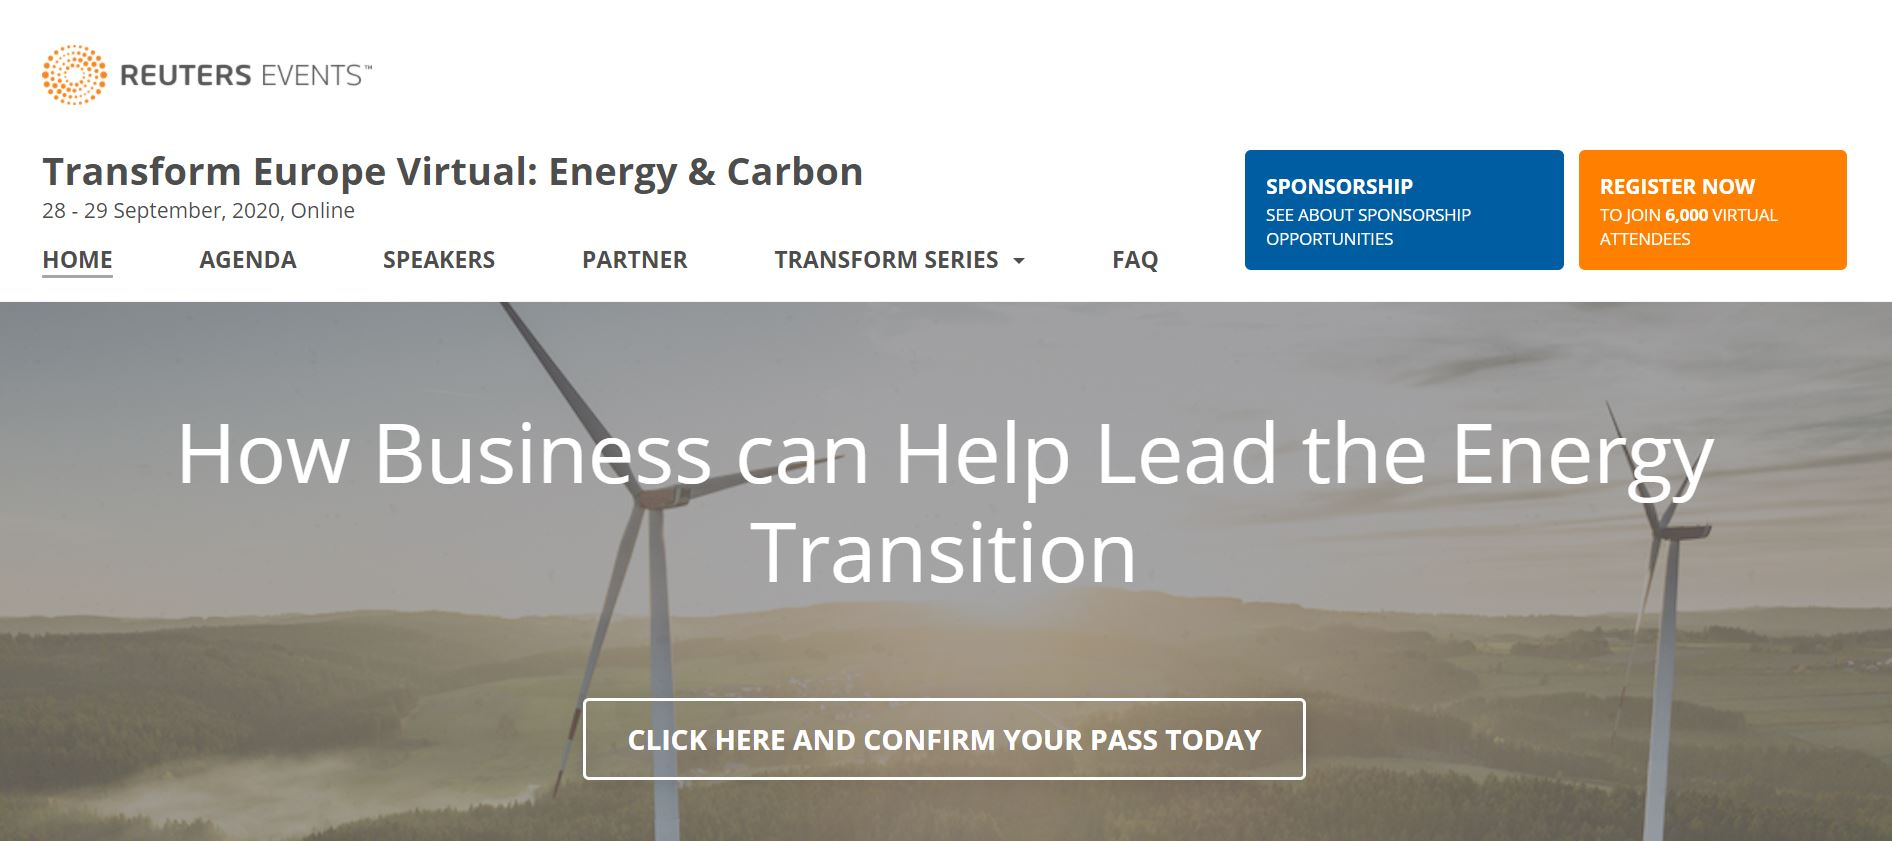 Reuters Events_ Transform Europe Virtual: Energy & Carbon